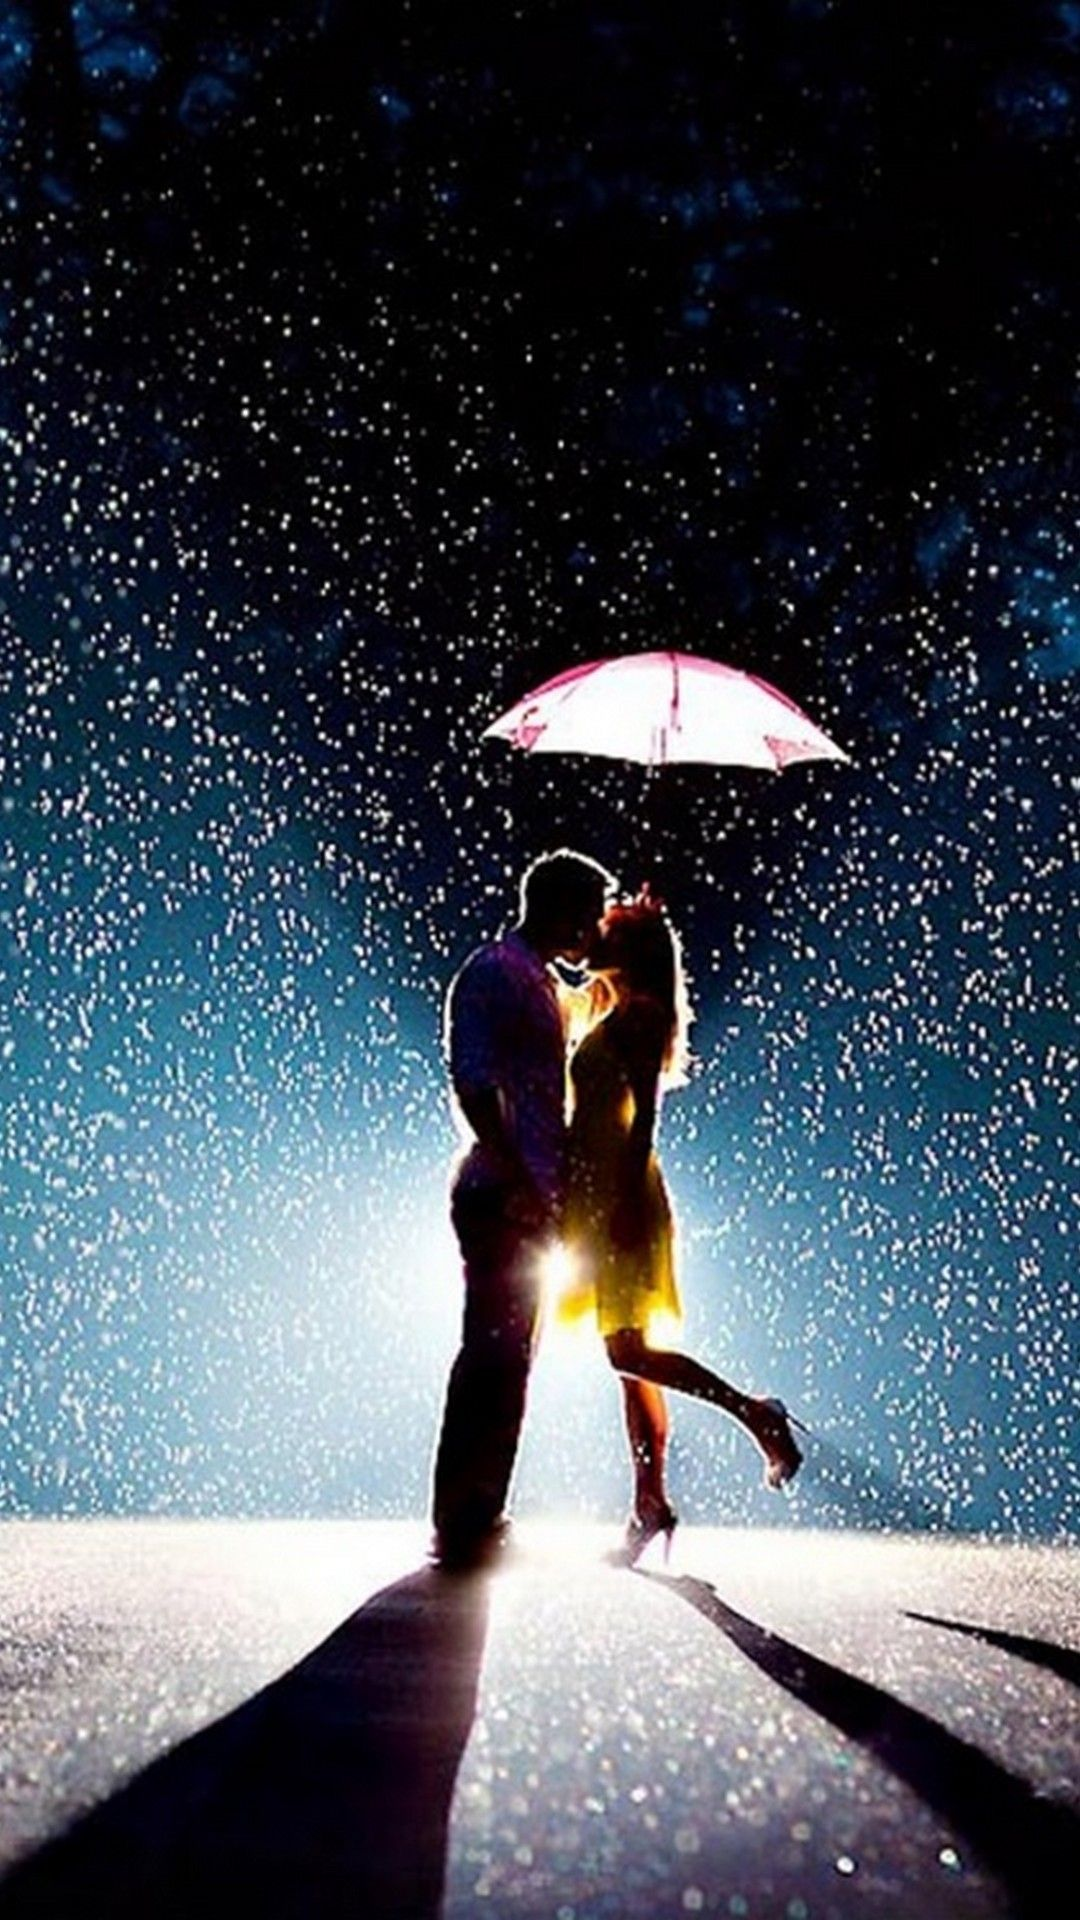 Romantic Couple In Rain Hd Wallpaper ...